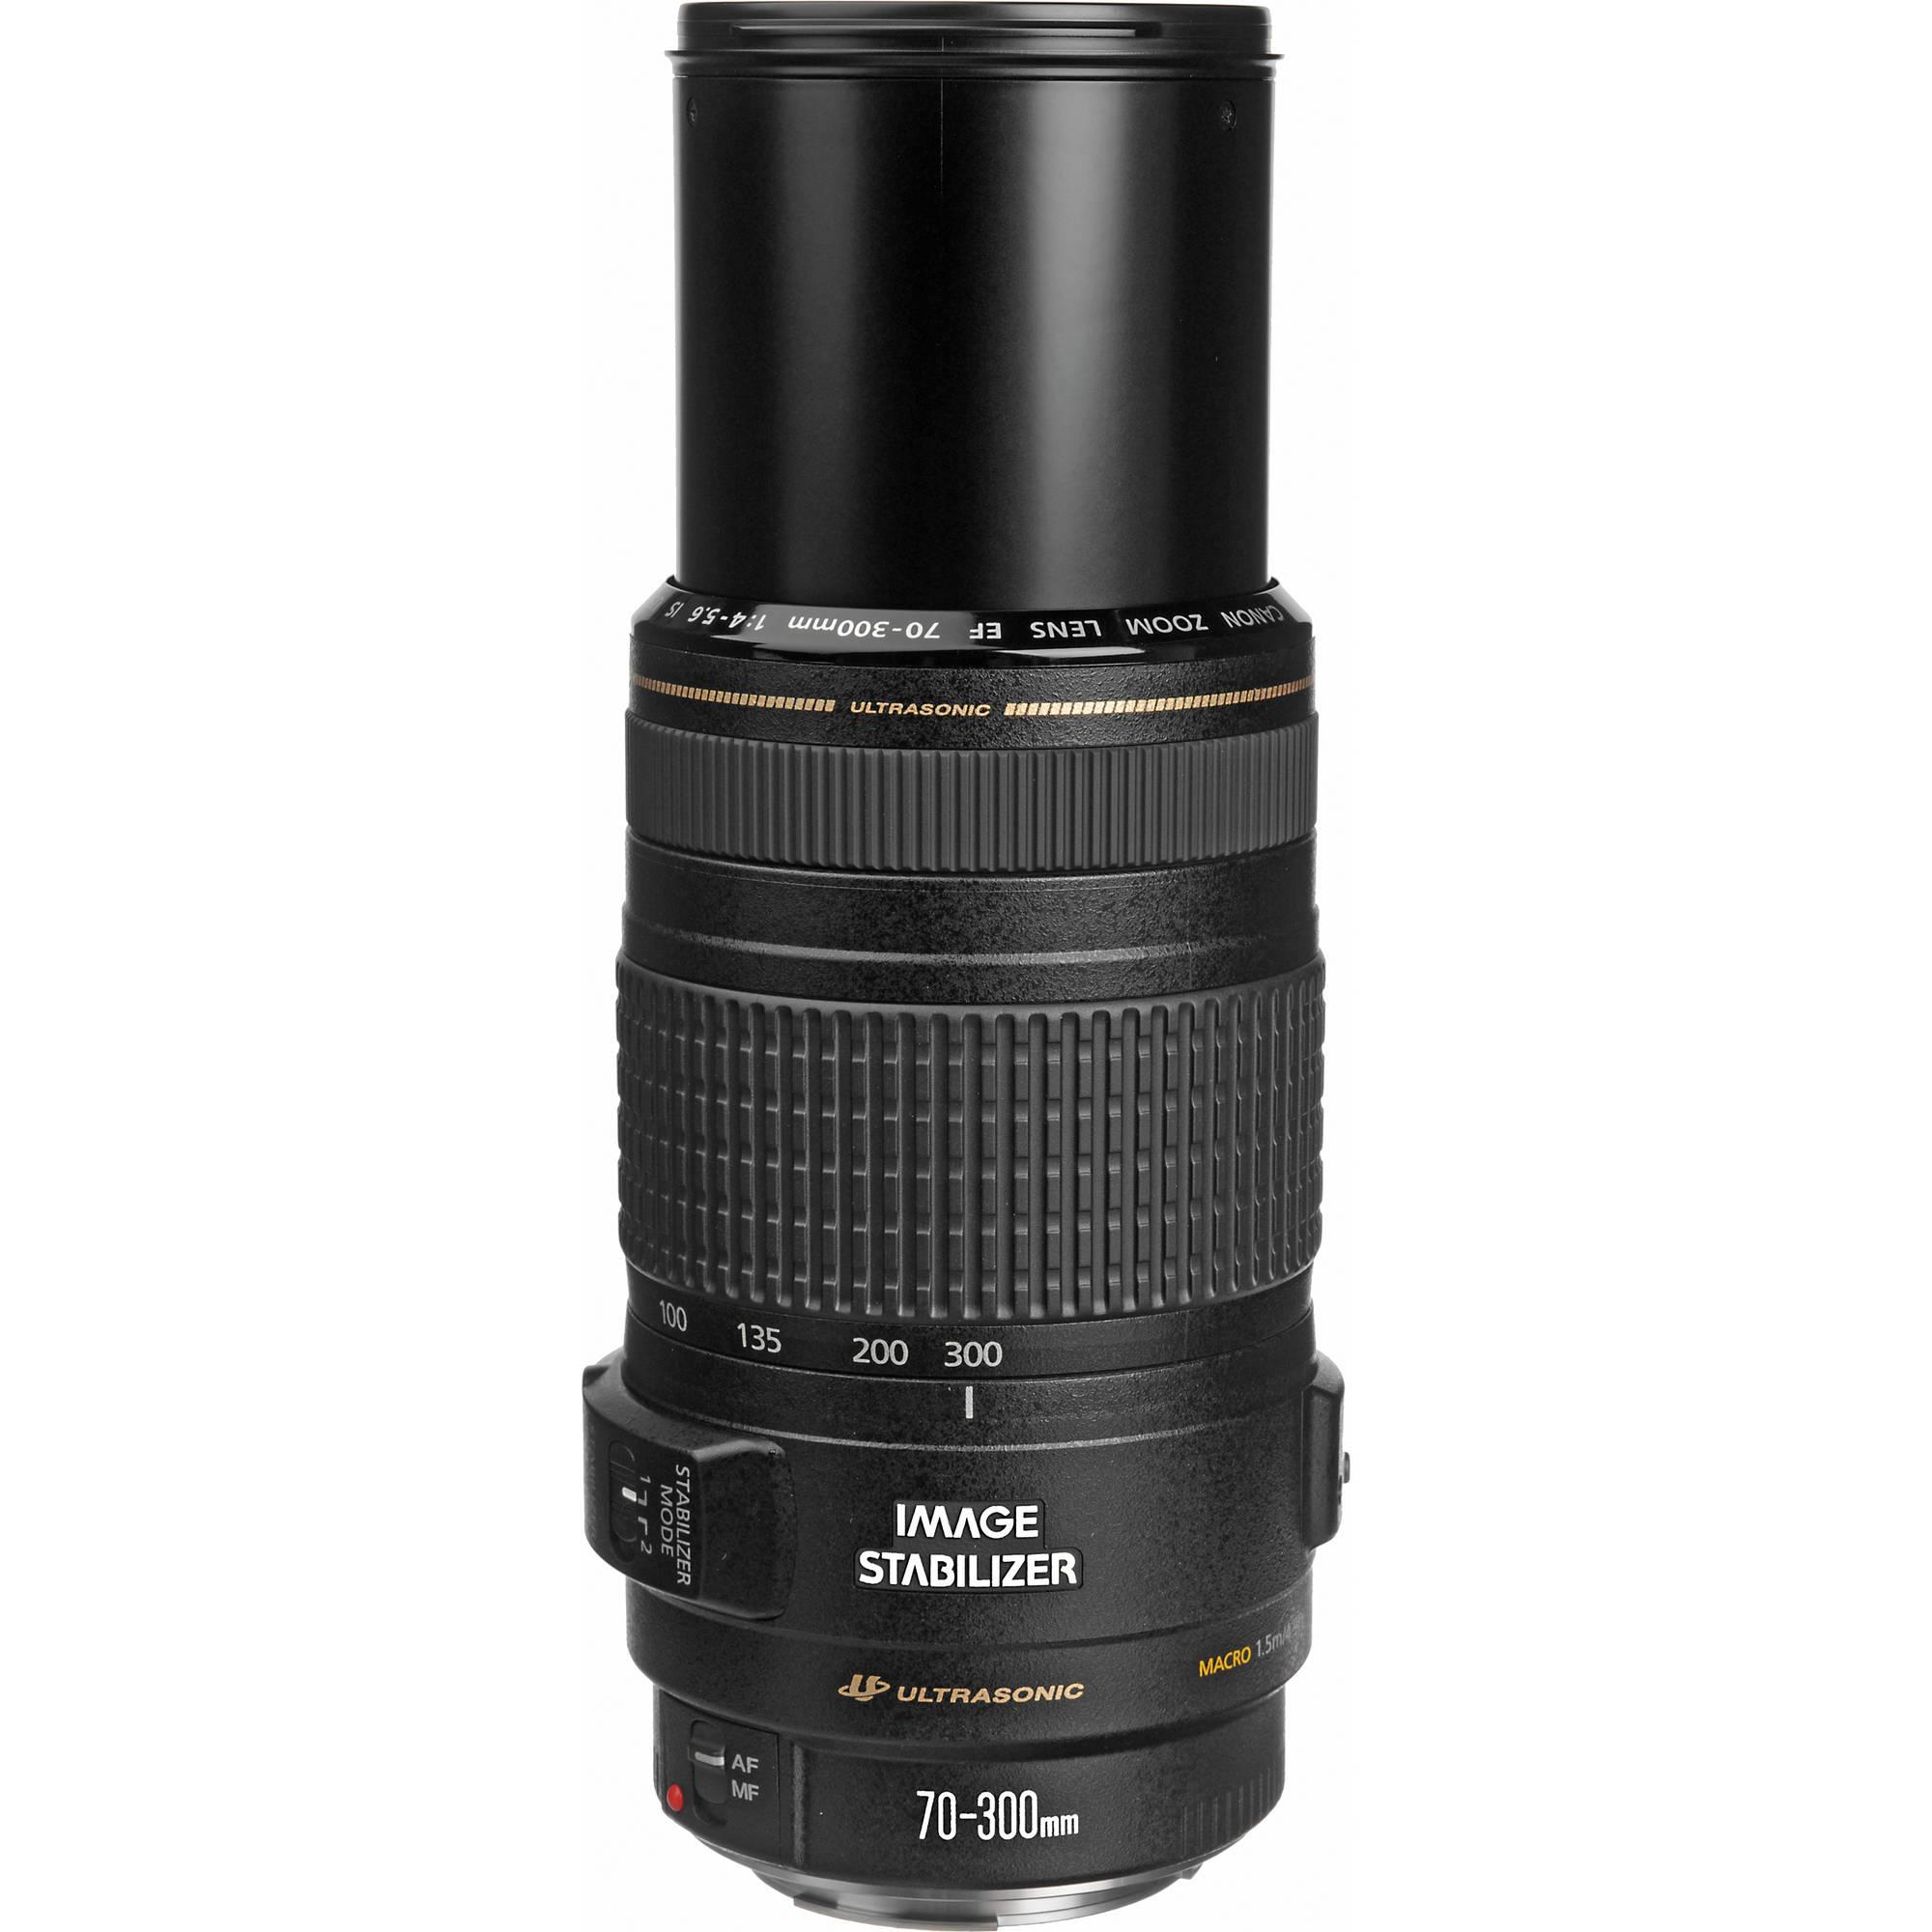 Canon EF 70-300mm f/4-5 6 IS USM Lens